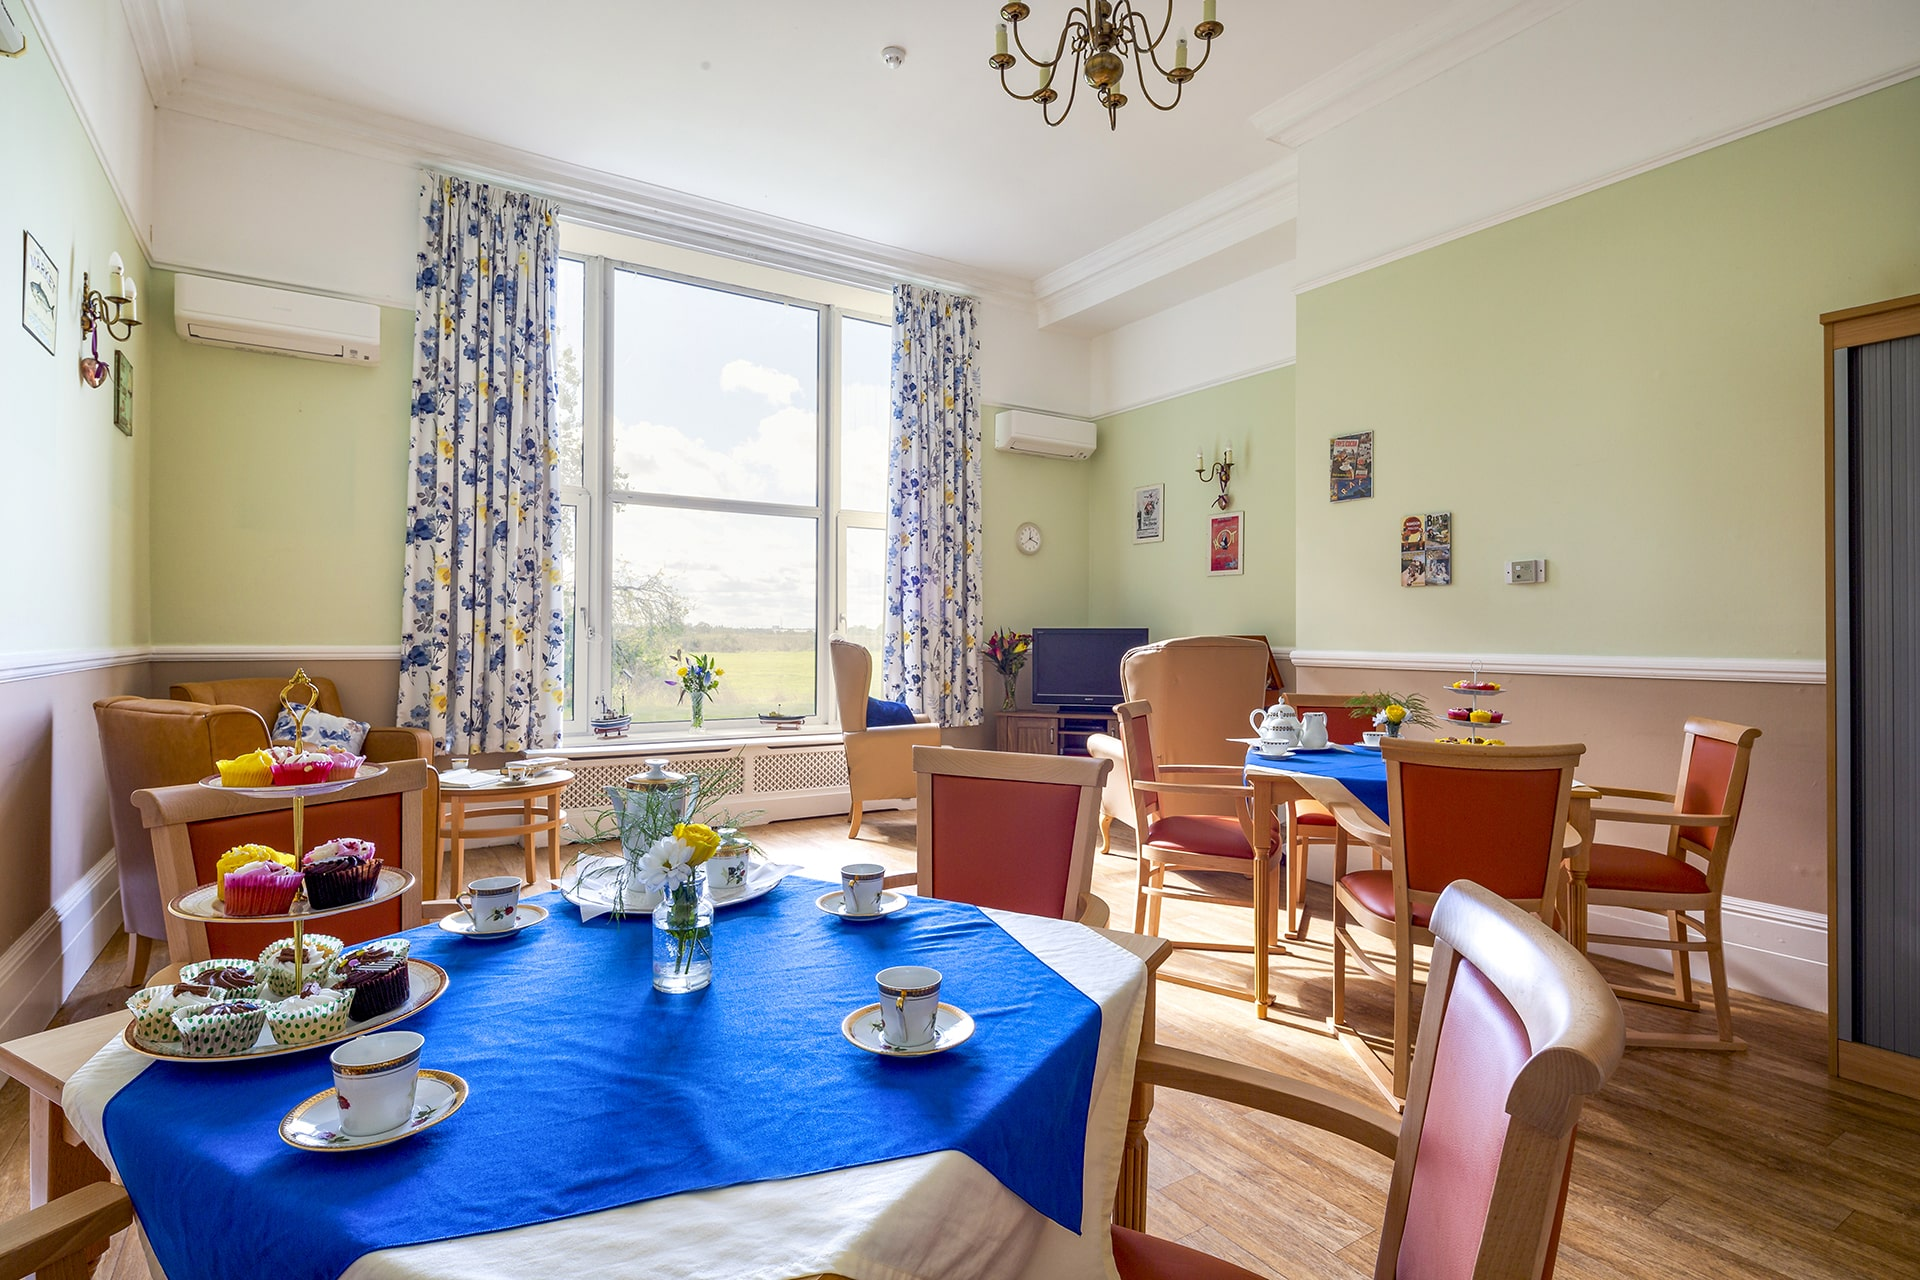 Stambridge Meadows Care Home Afternoon Tea